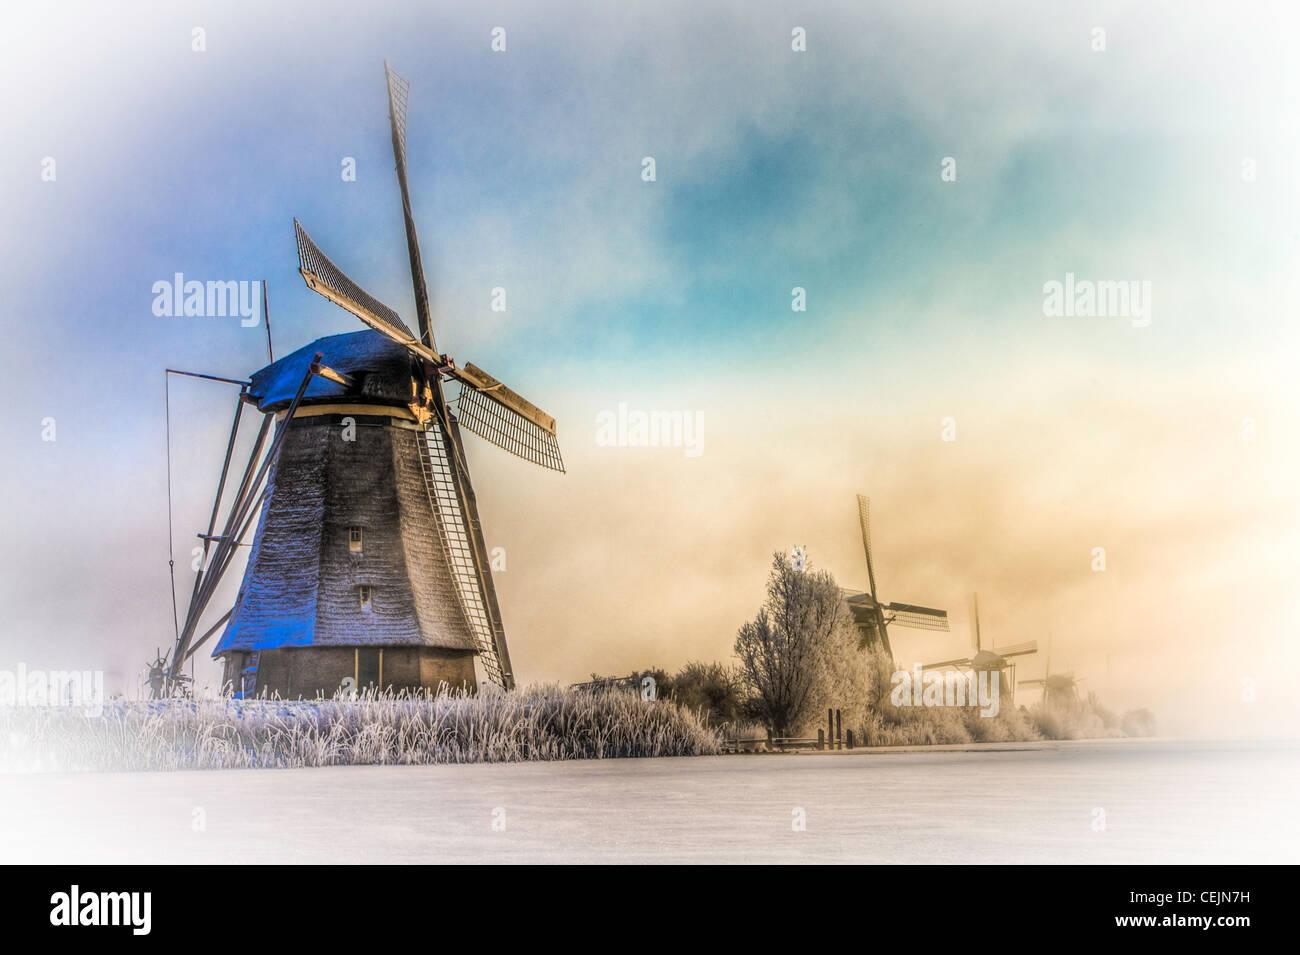 Mills at kinderdijk the netherlands - Stock Image